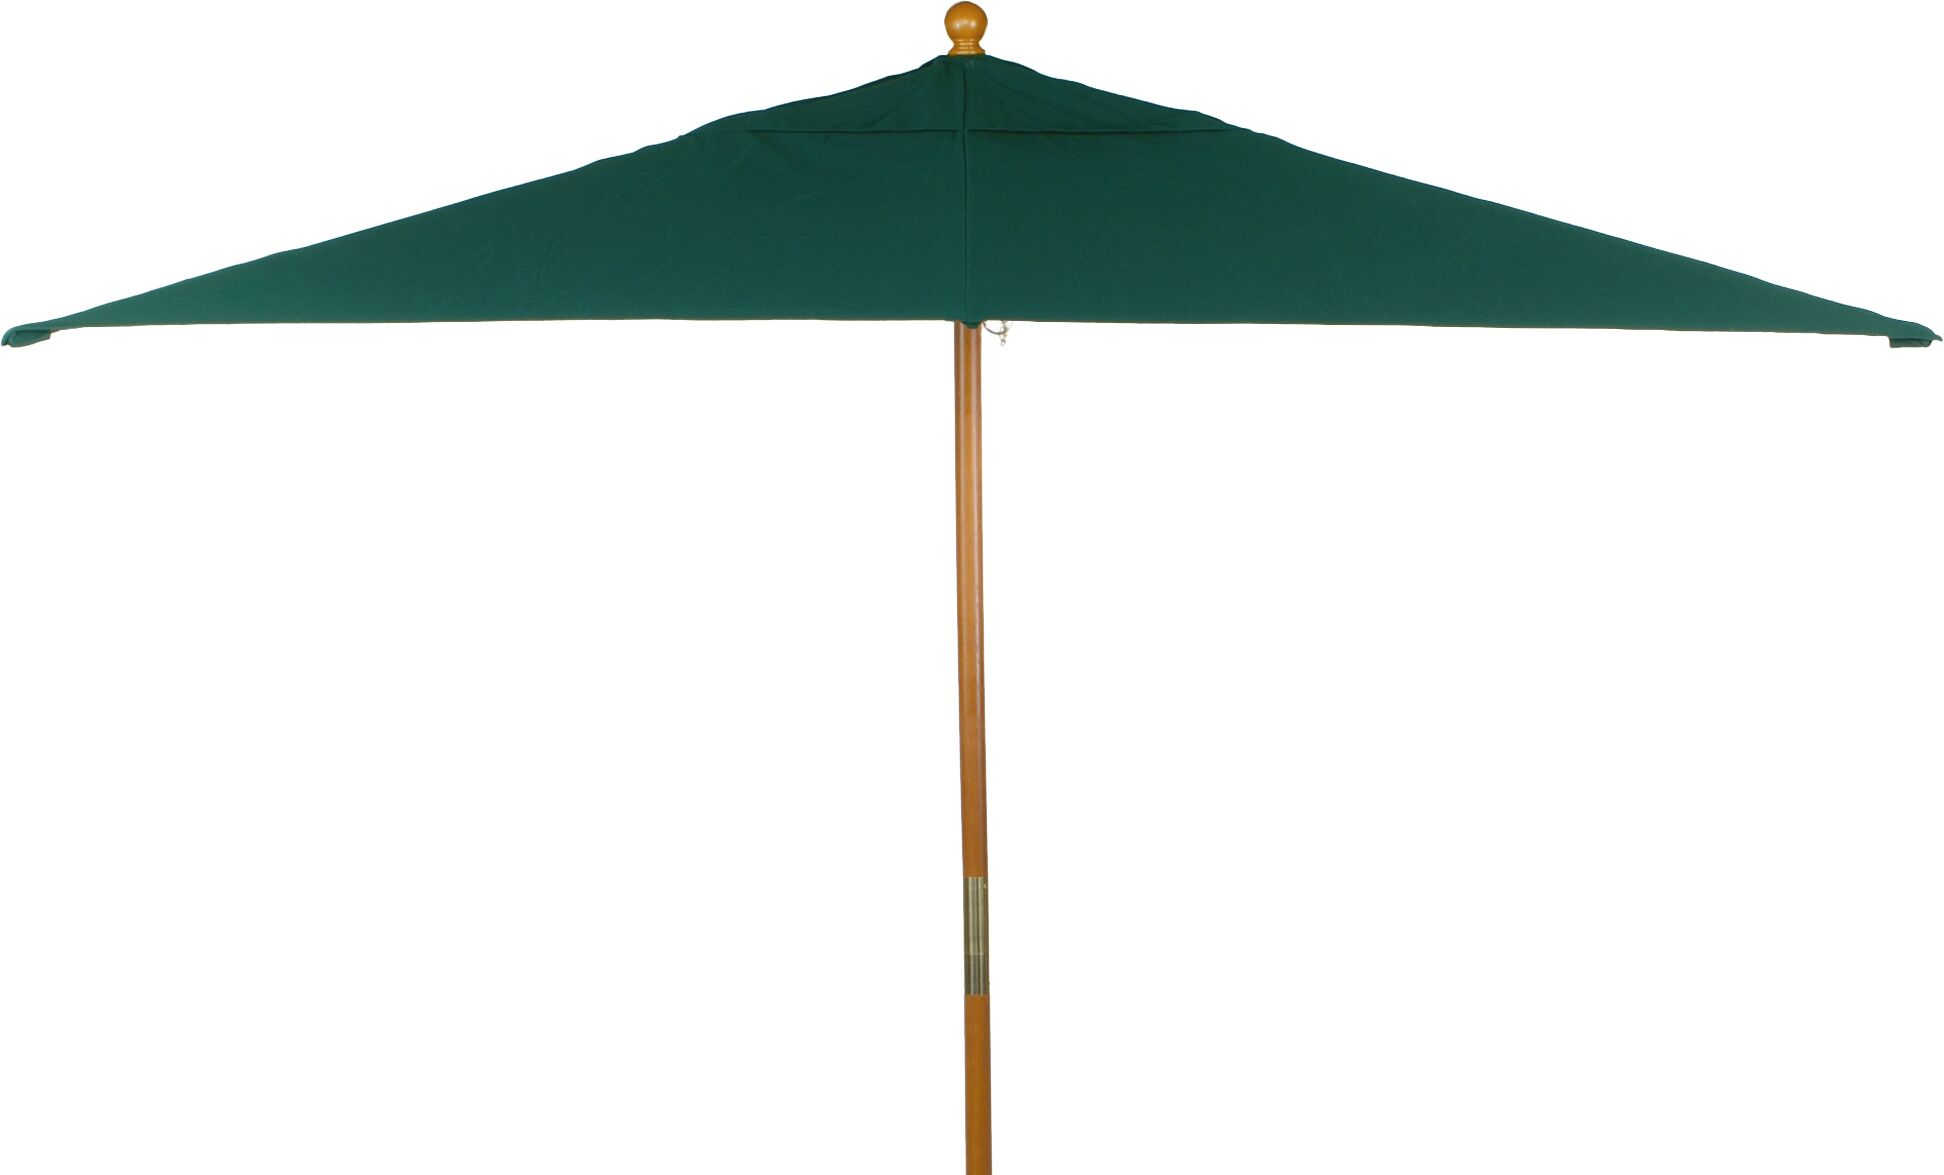 Harpersfield 10' X 6' Rectangular Market Umbrella Fabric: Hunter